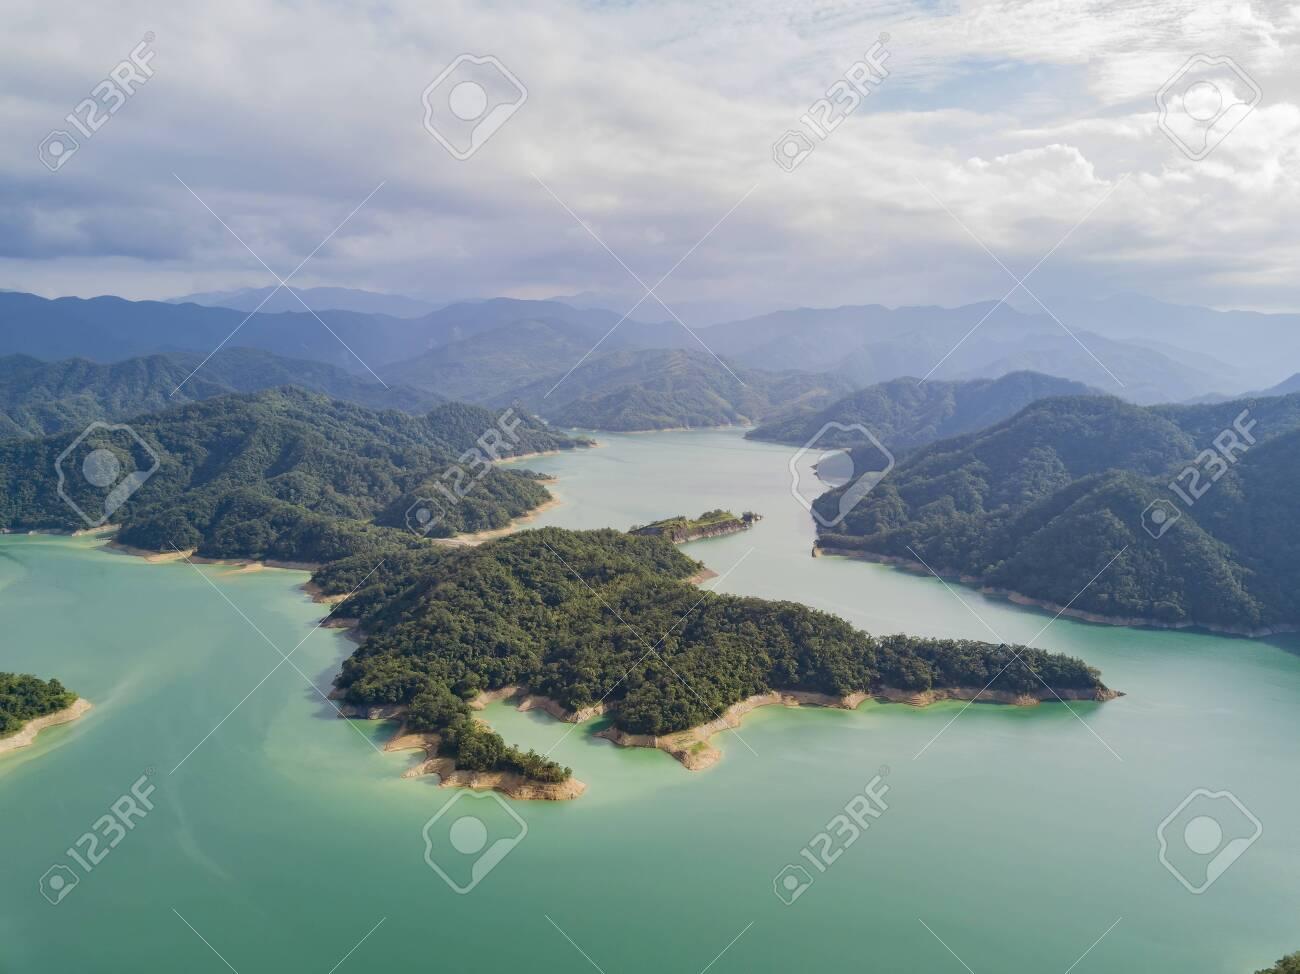 Aerial view of the beautiful Crocodile Island, Qiandao Lake at Shiding District, New Taipei City, Taiwan - 143394110